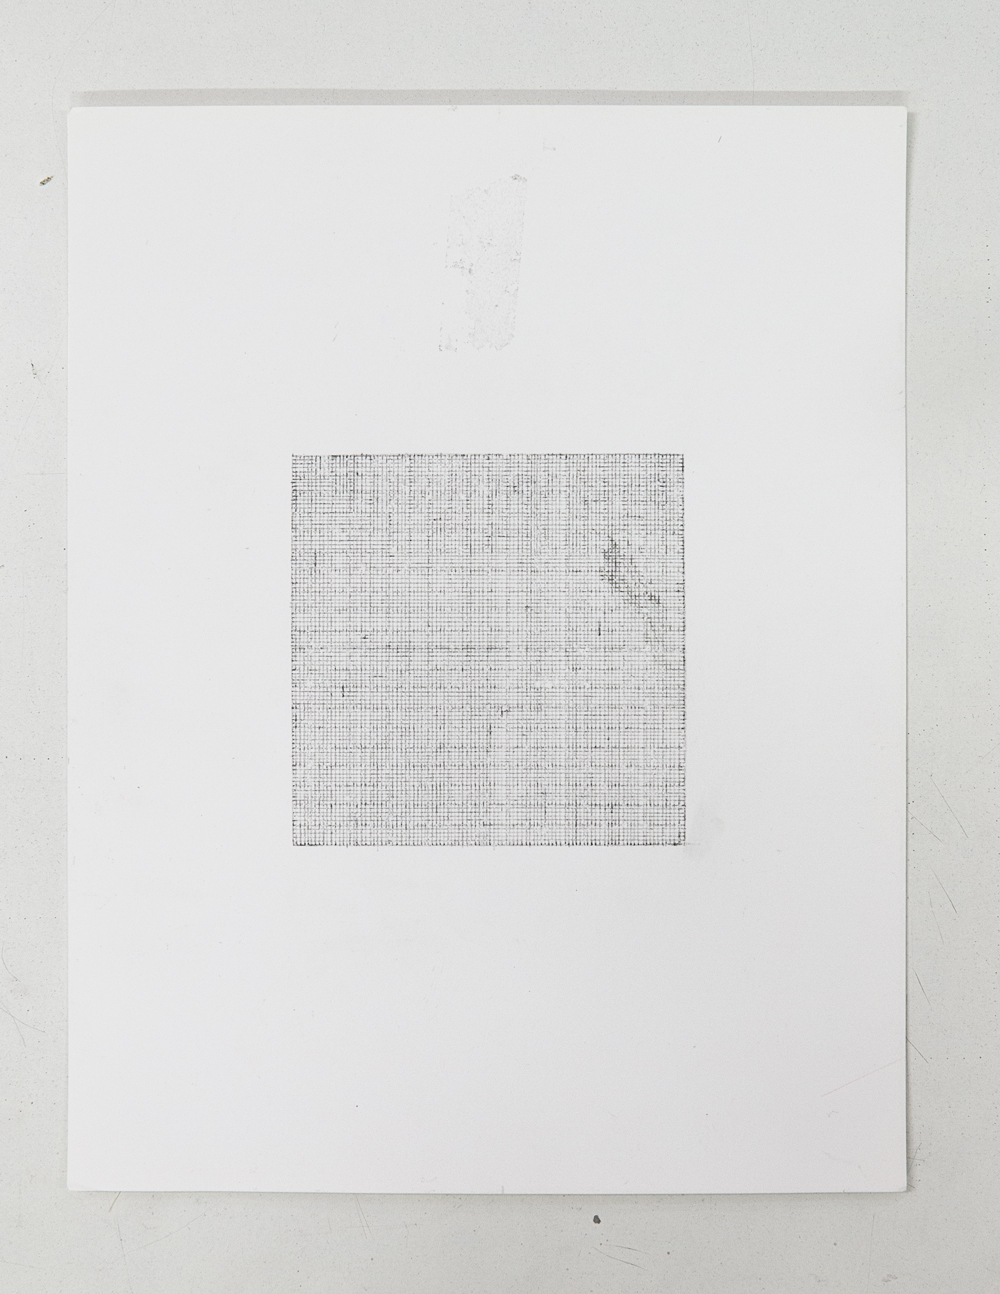 (PRISONTIME/PRISONINME: Transition to Metric) 1mm x 1mm on 10cm x 10cm,  2014   Pencil on semi-matte inkjet fiber paper, 8.5 in.x 11 in.